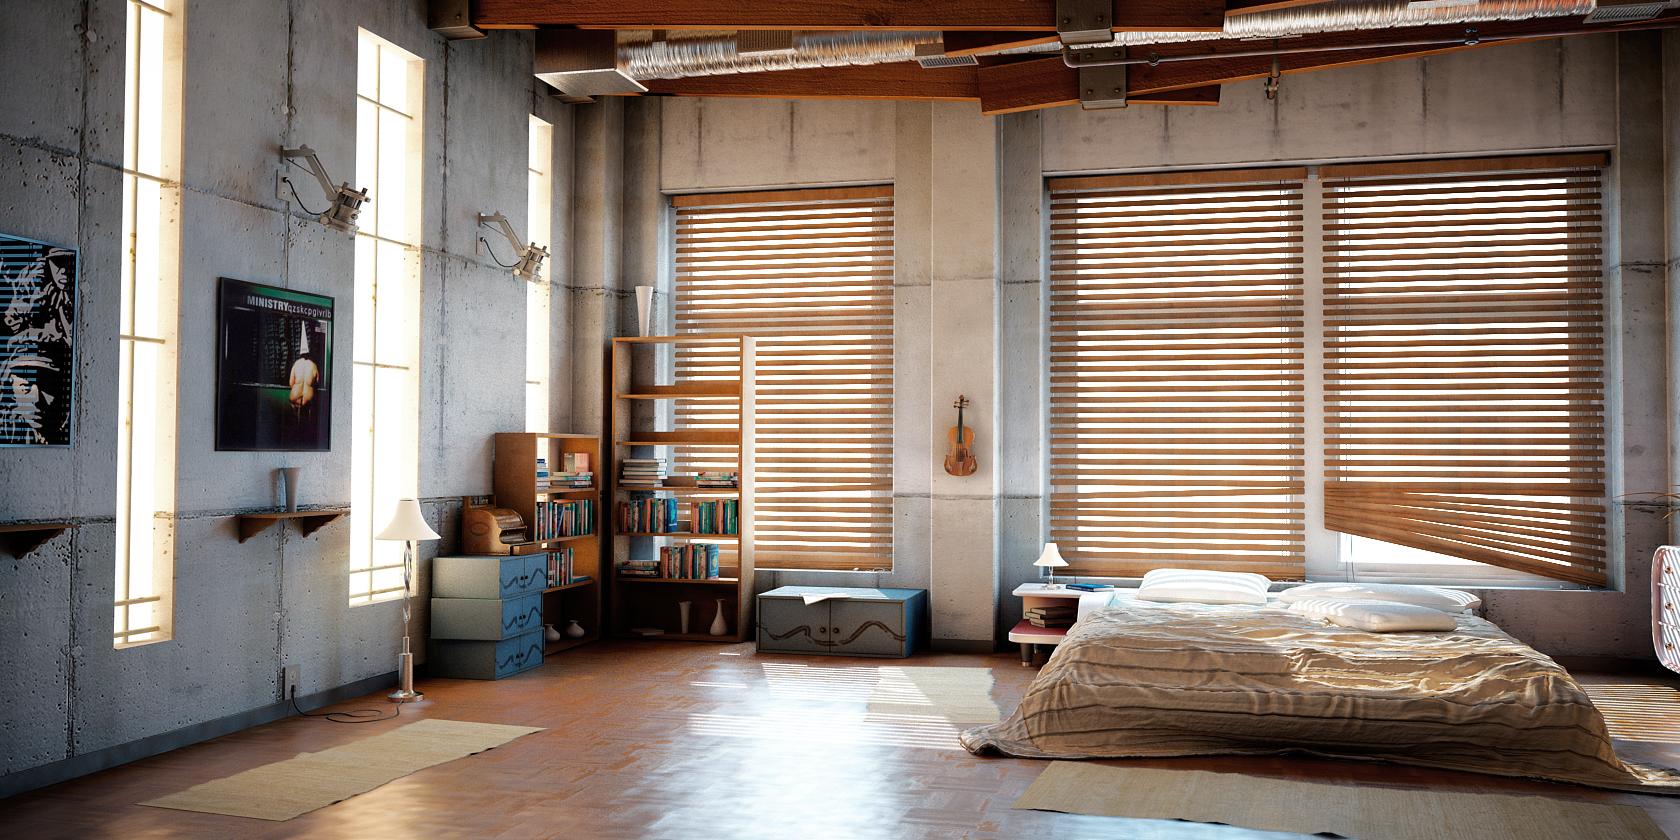 industrial loft by denisvema on deviantart. Black Bedroom Furniture Sets. Home Design Ideas